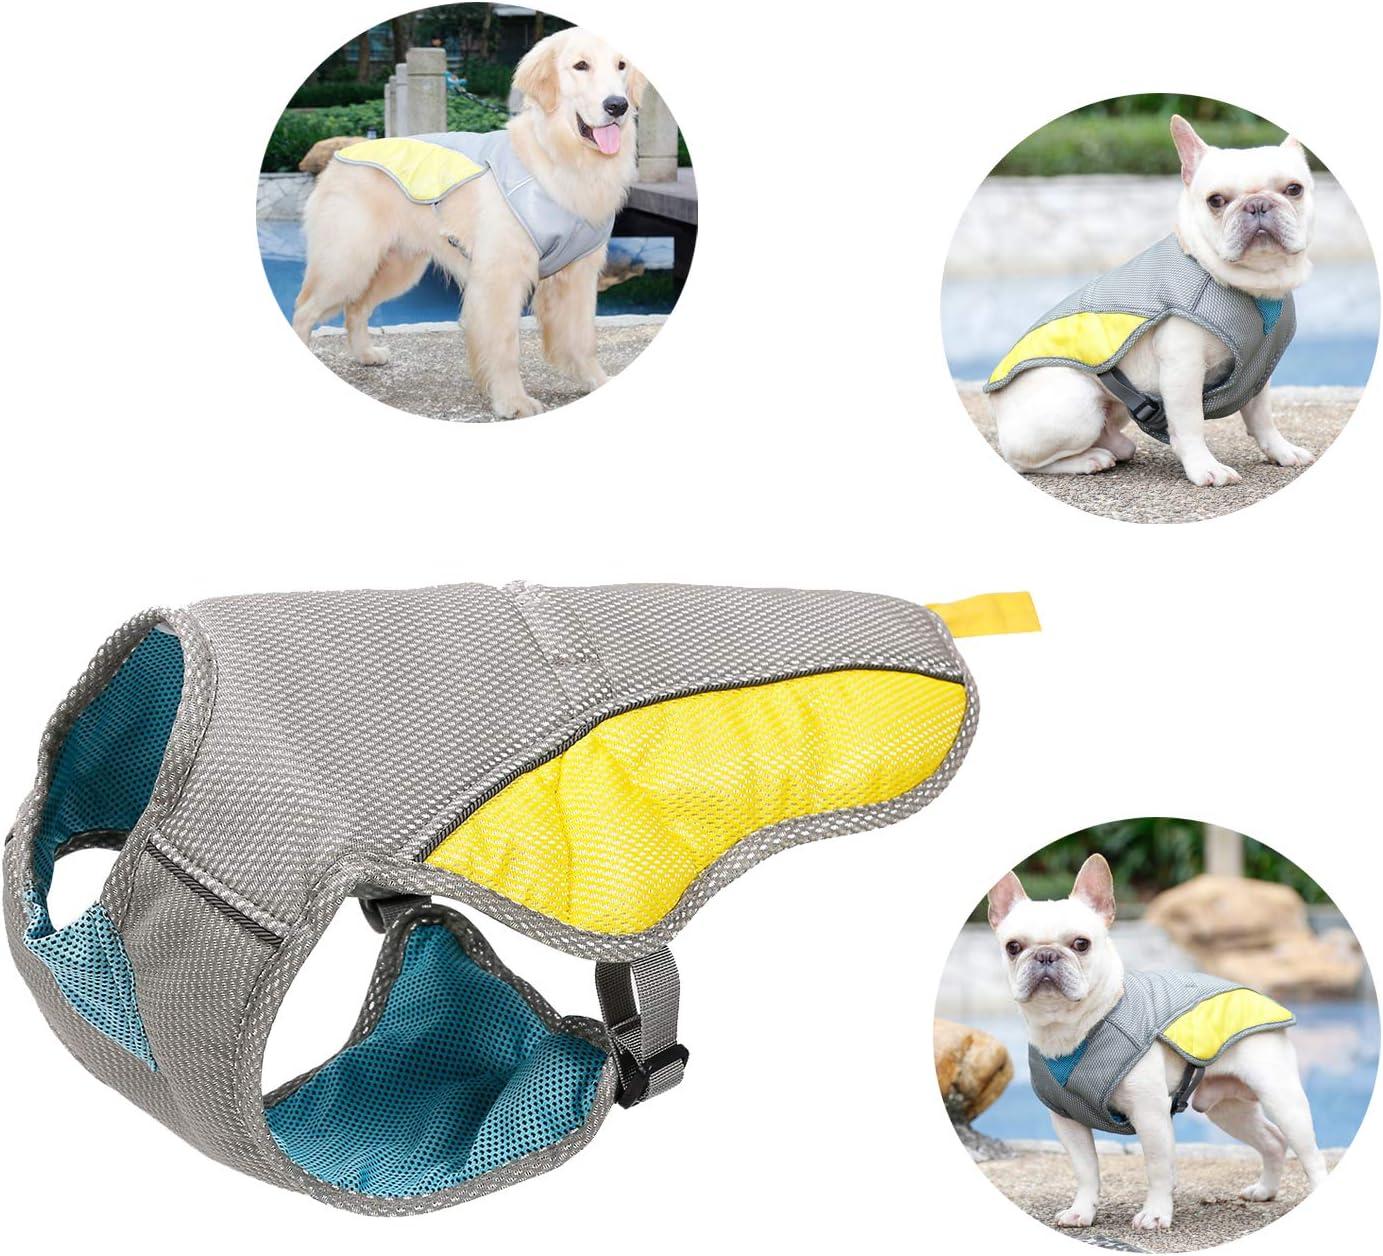 Tineer Pet Cooling Vest, Reflective Vest Dog Jacket Cooler Summer for Small Medium Large Dogs Walking,Climbing,Sports